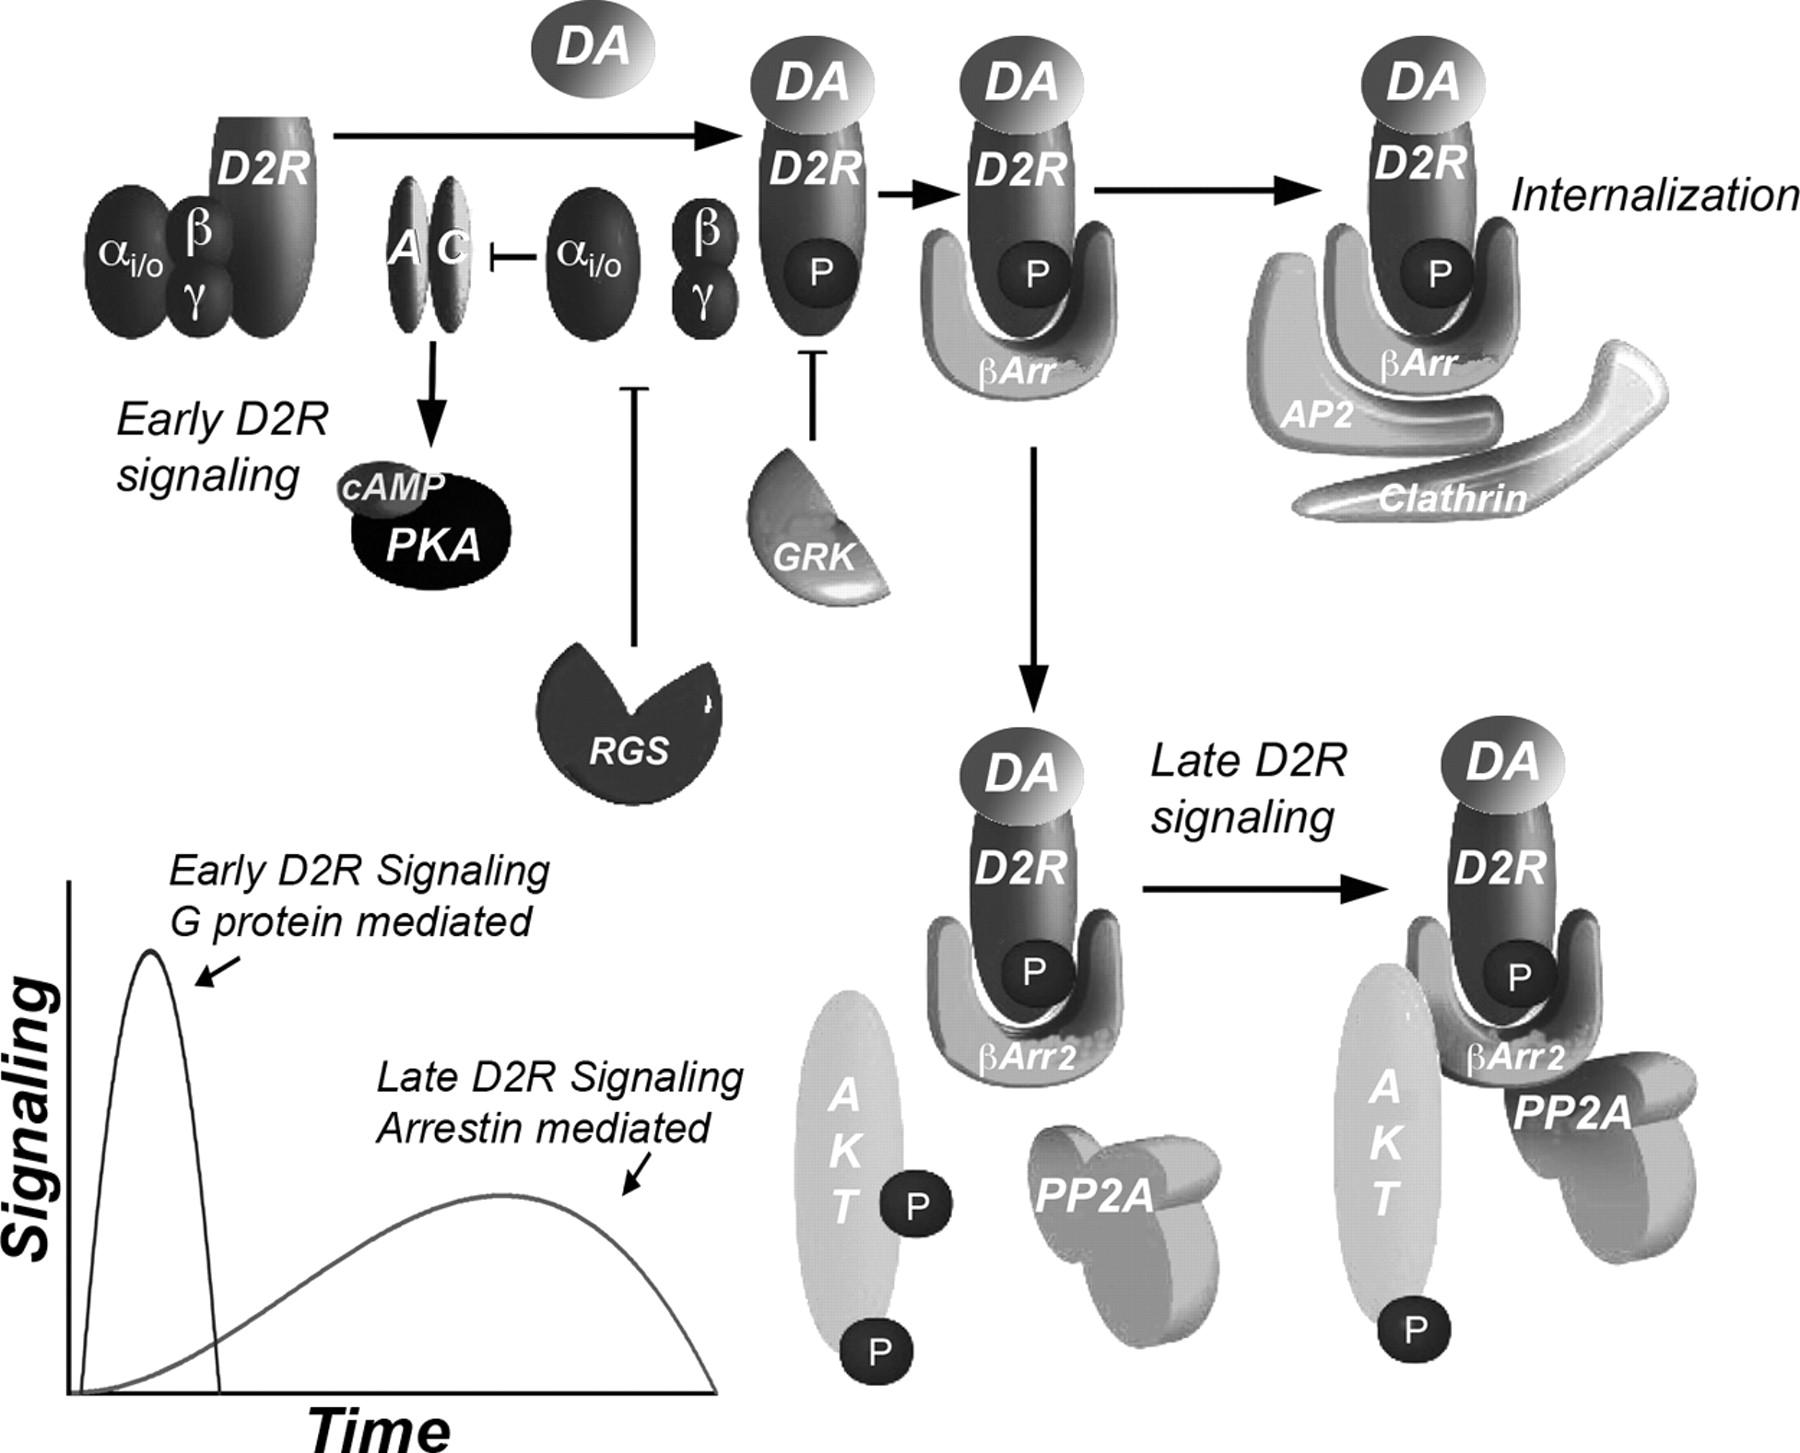 how to fix dopamine receptors